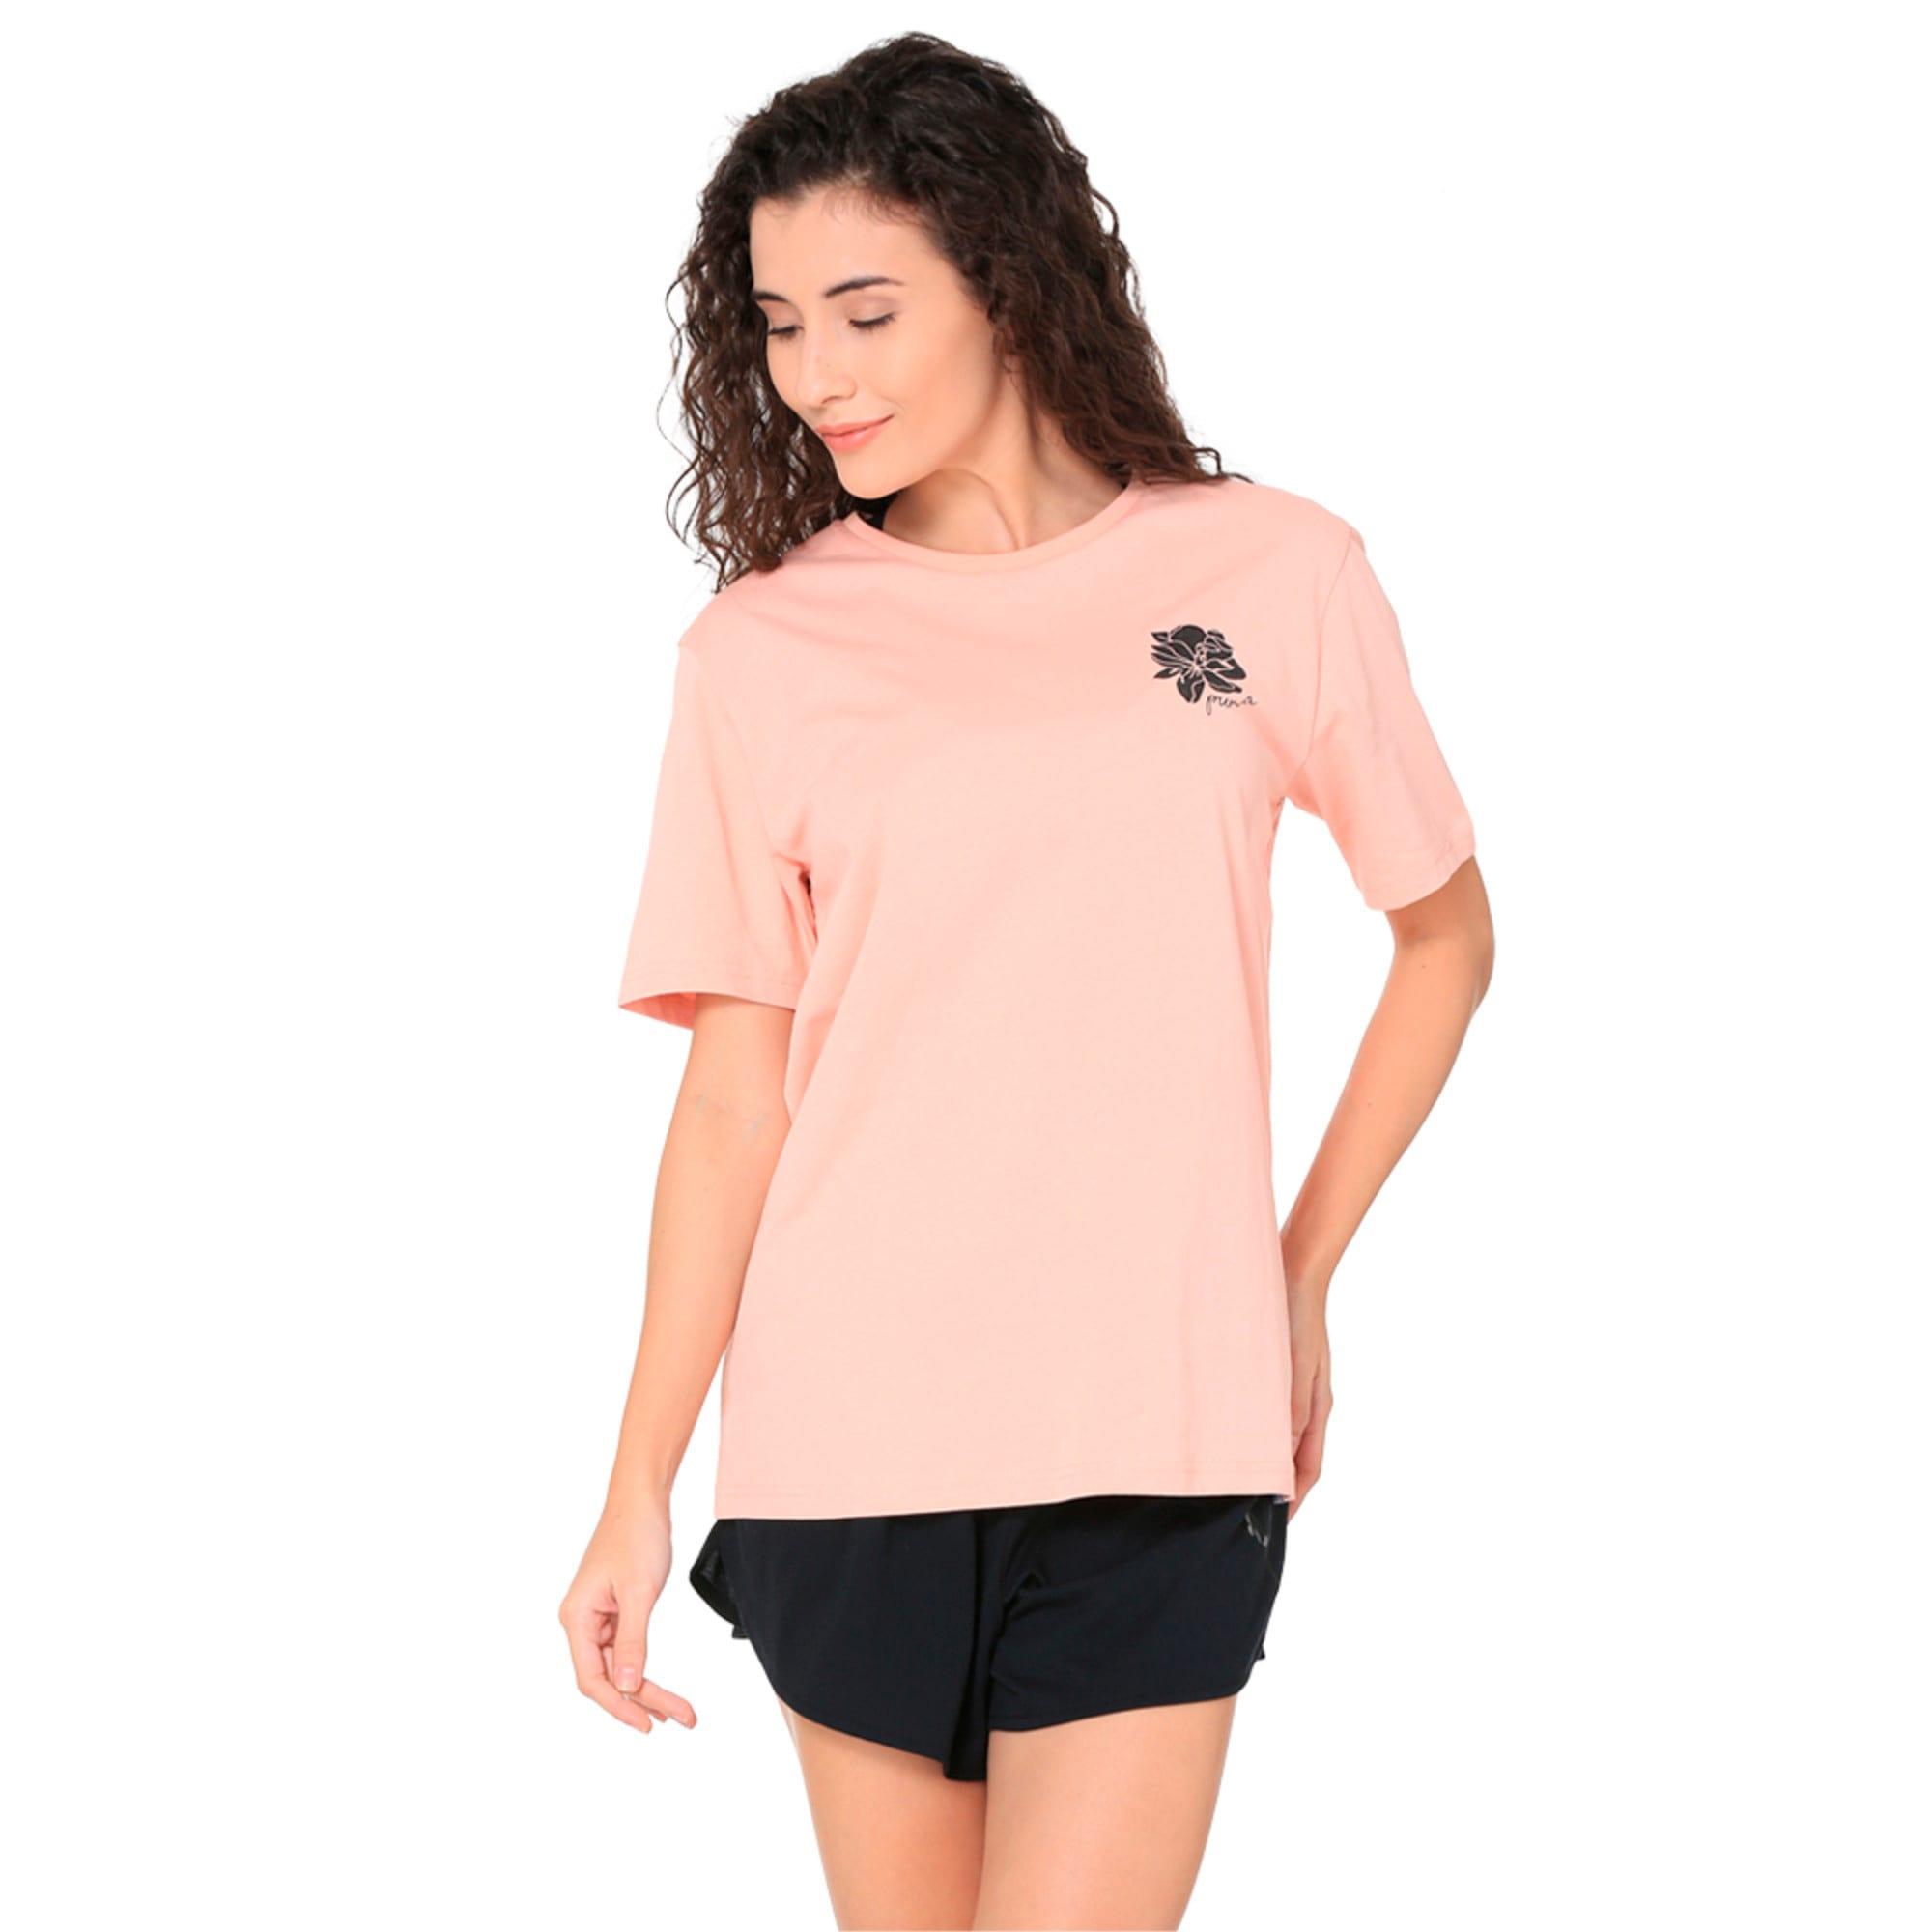 Thumbnail 2 of Women's Graphic T-shirt, Peach Beige, medium-IND